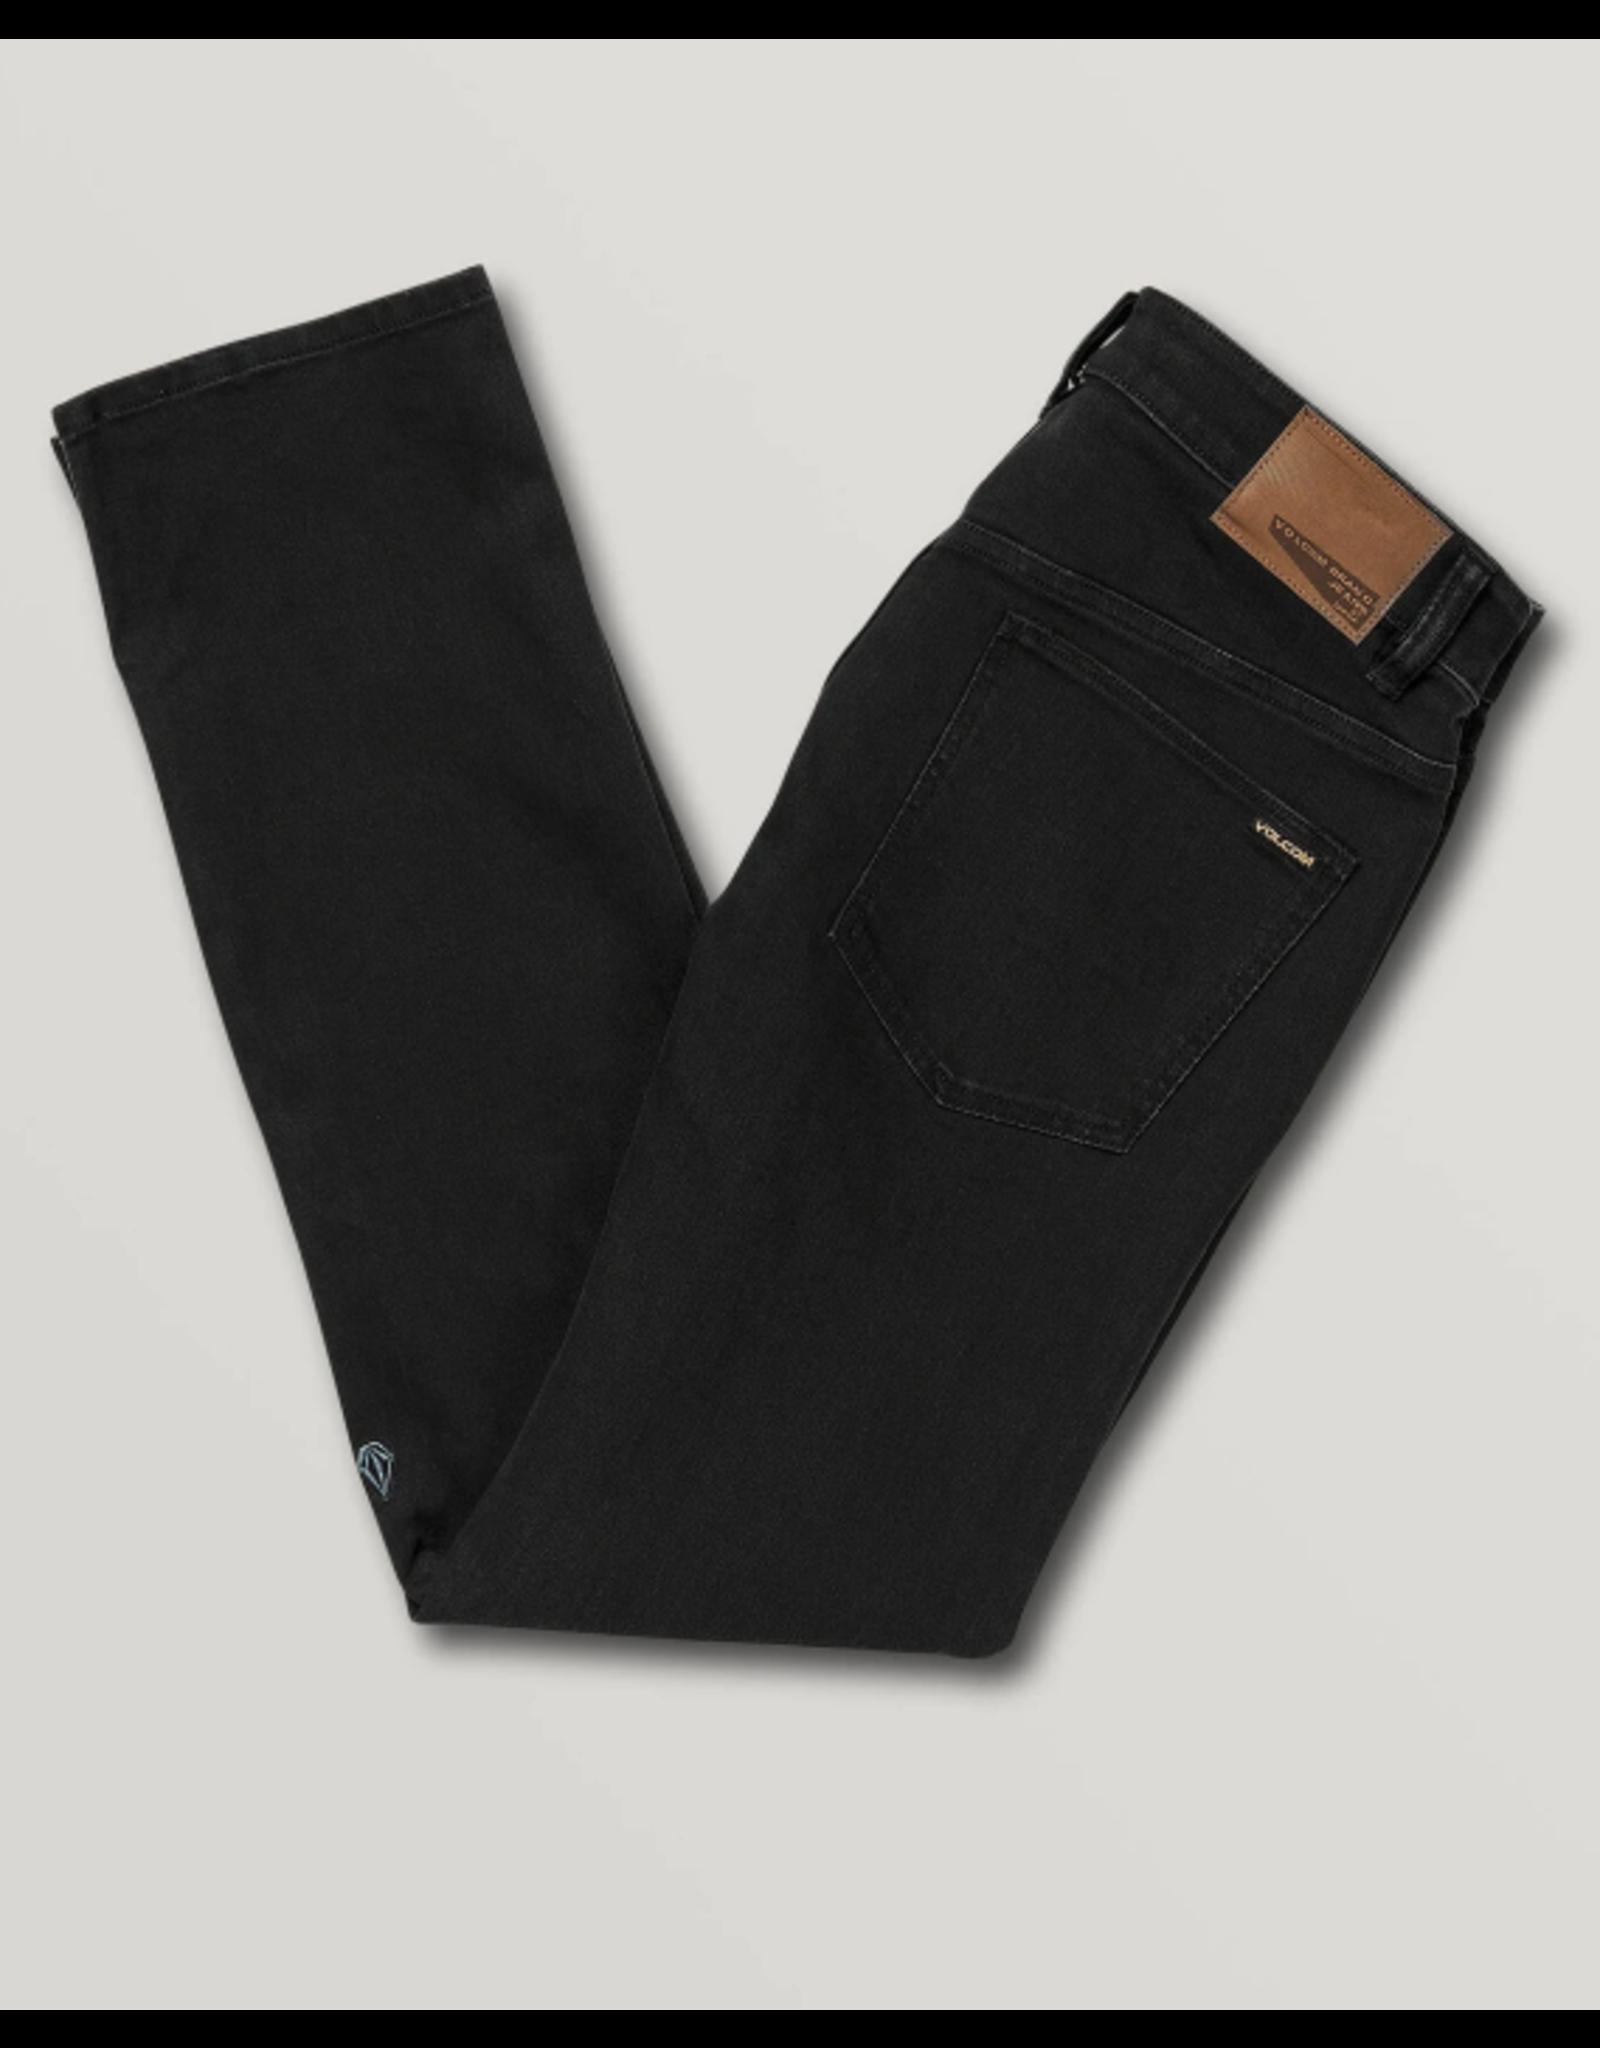 Volcom Solver Modern Fit Jeans - Blackout